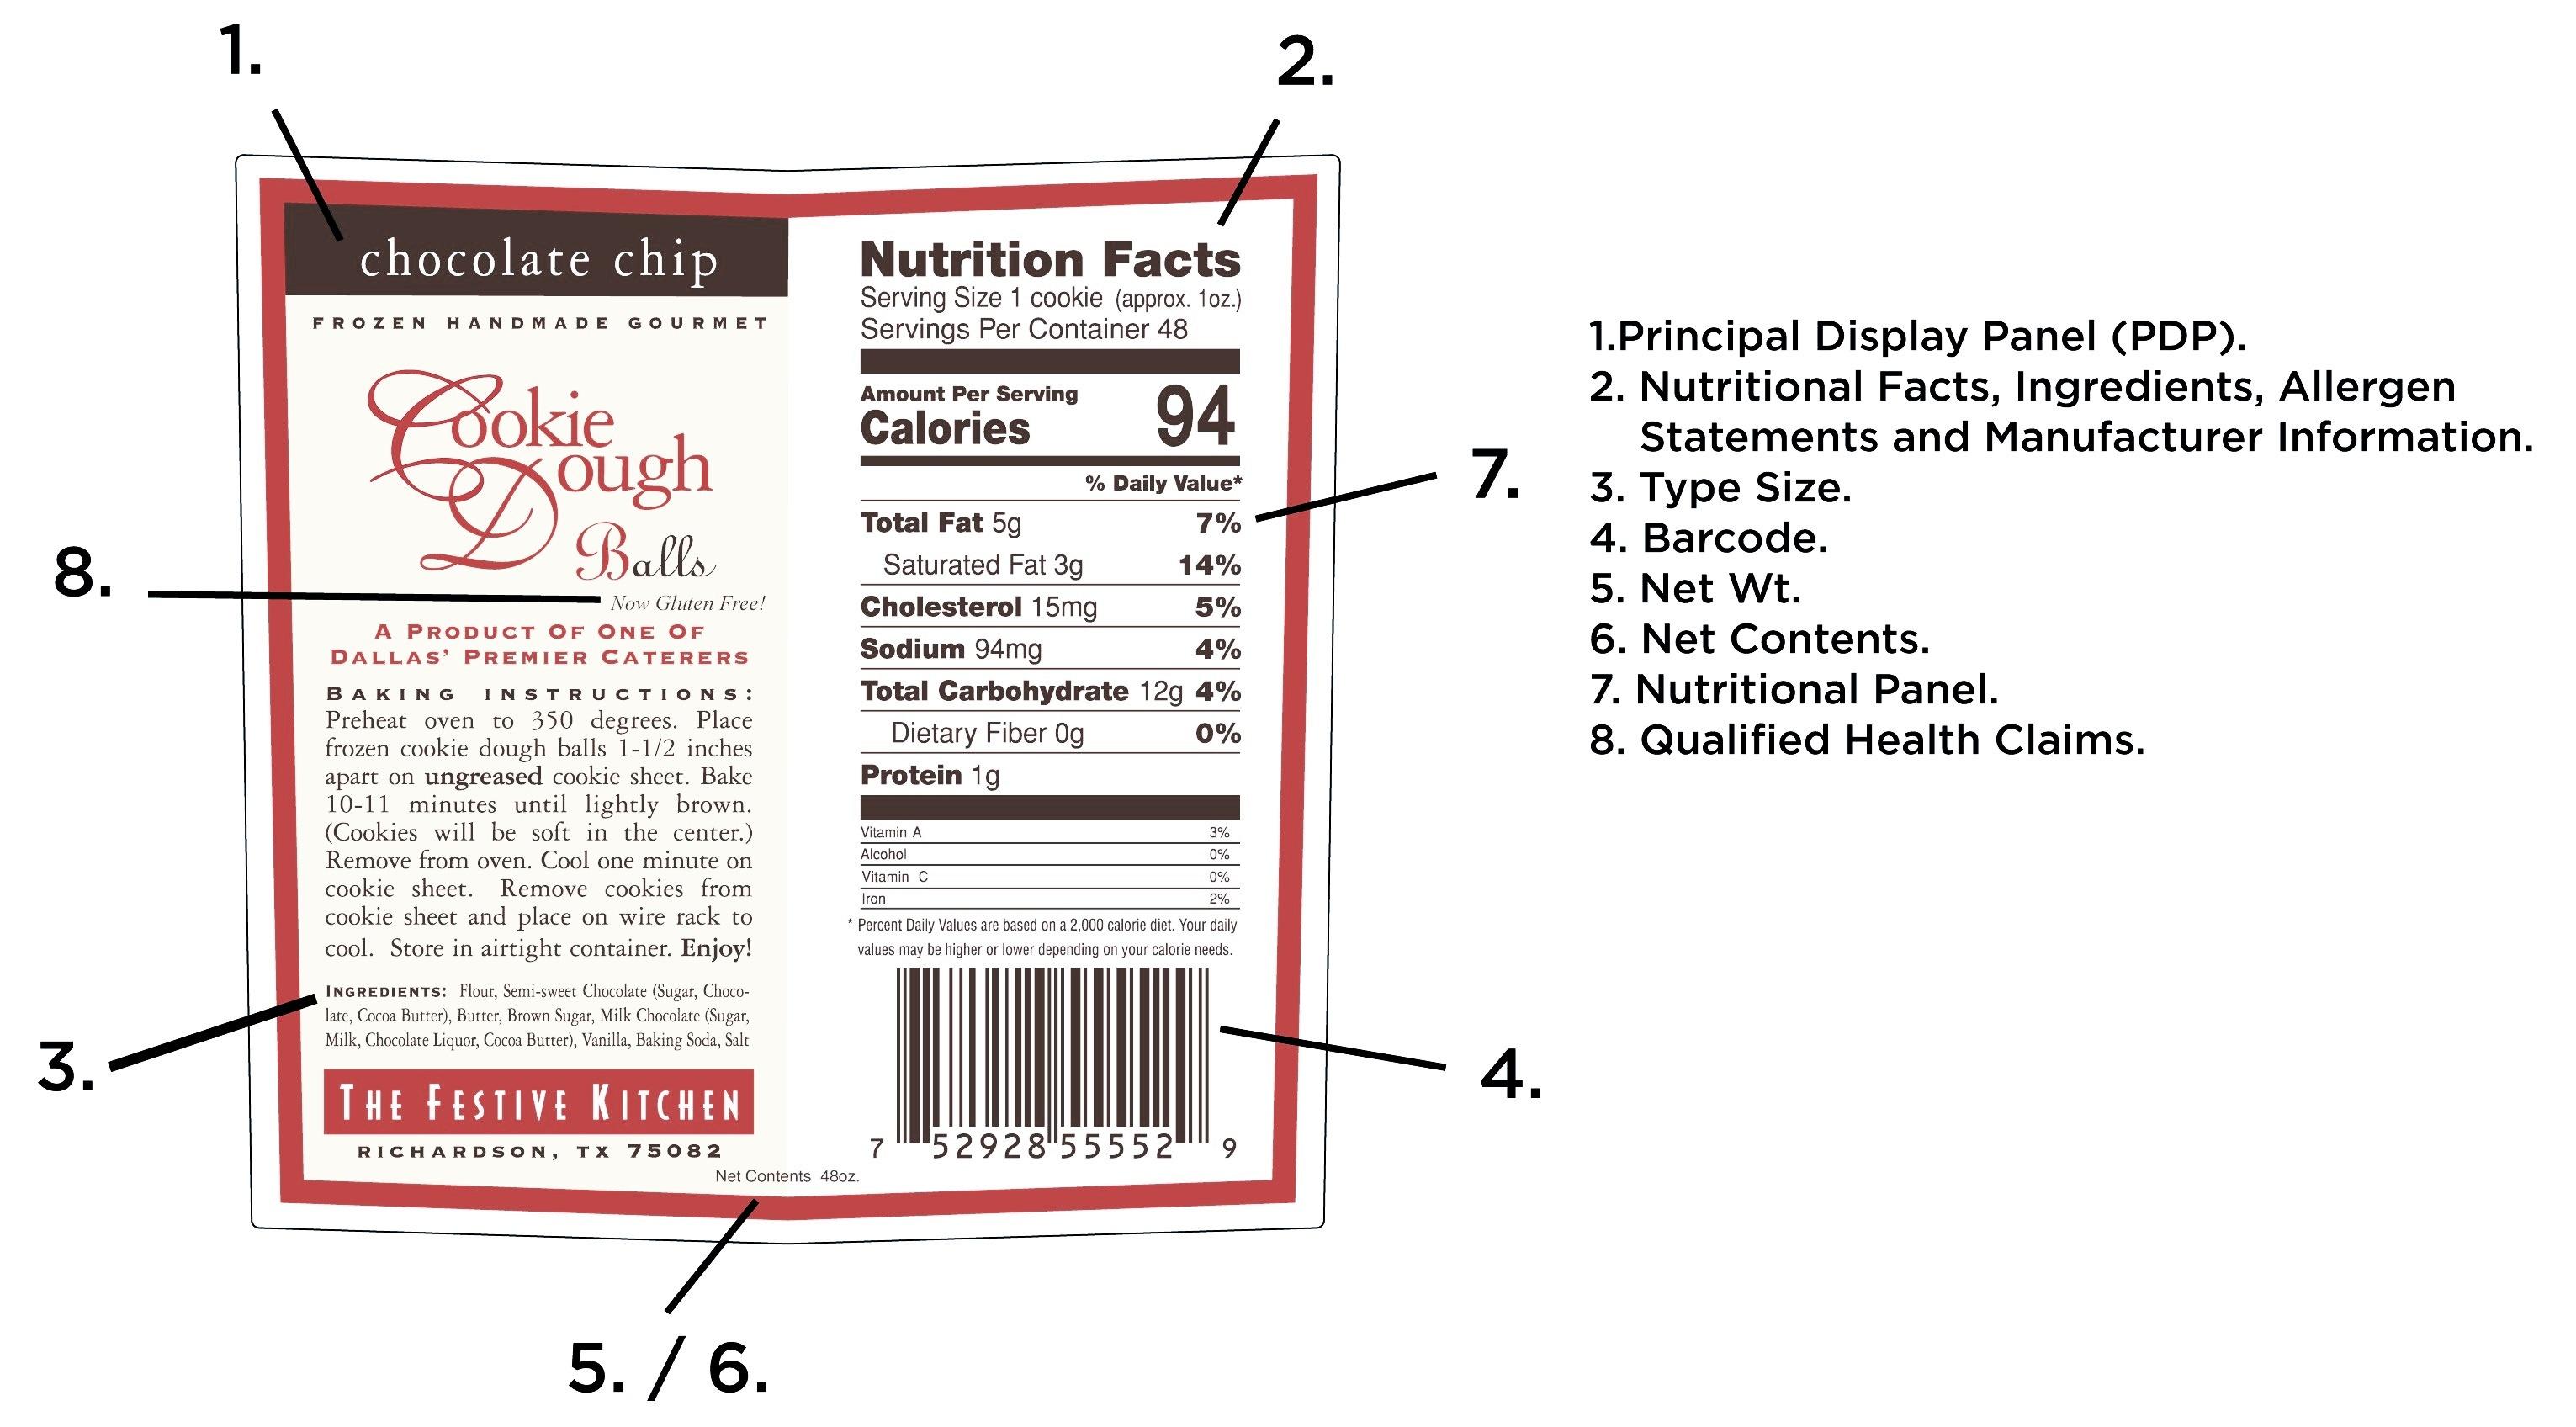 SixB_Food_Label_FDA_Parameters_Example